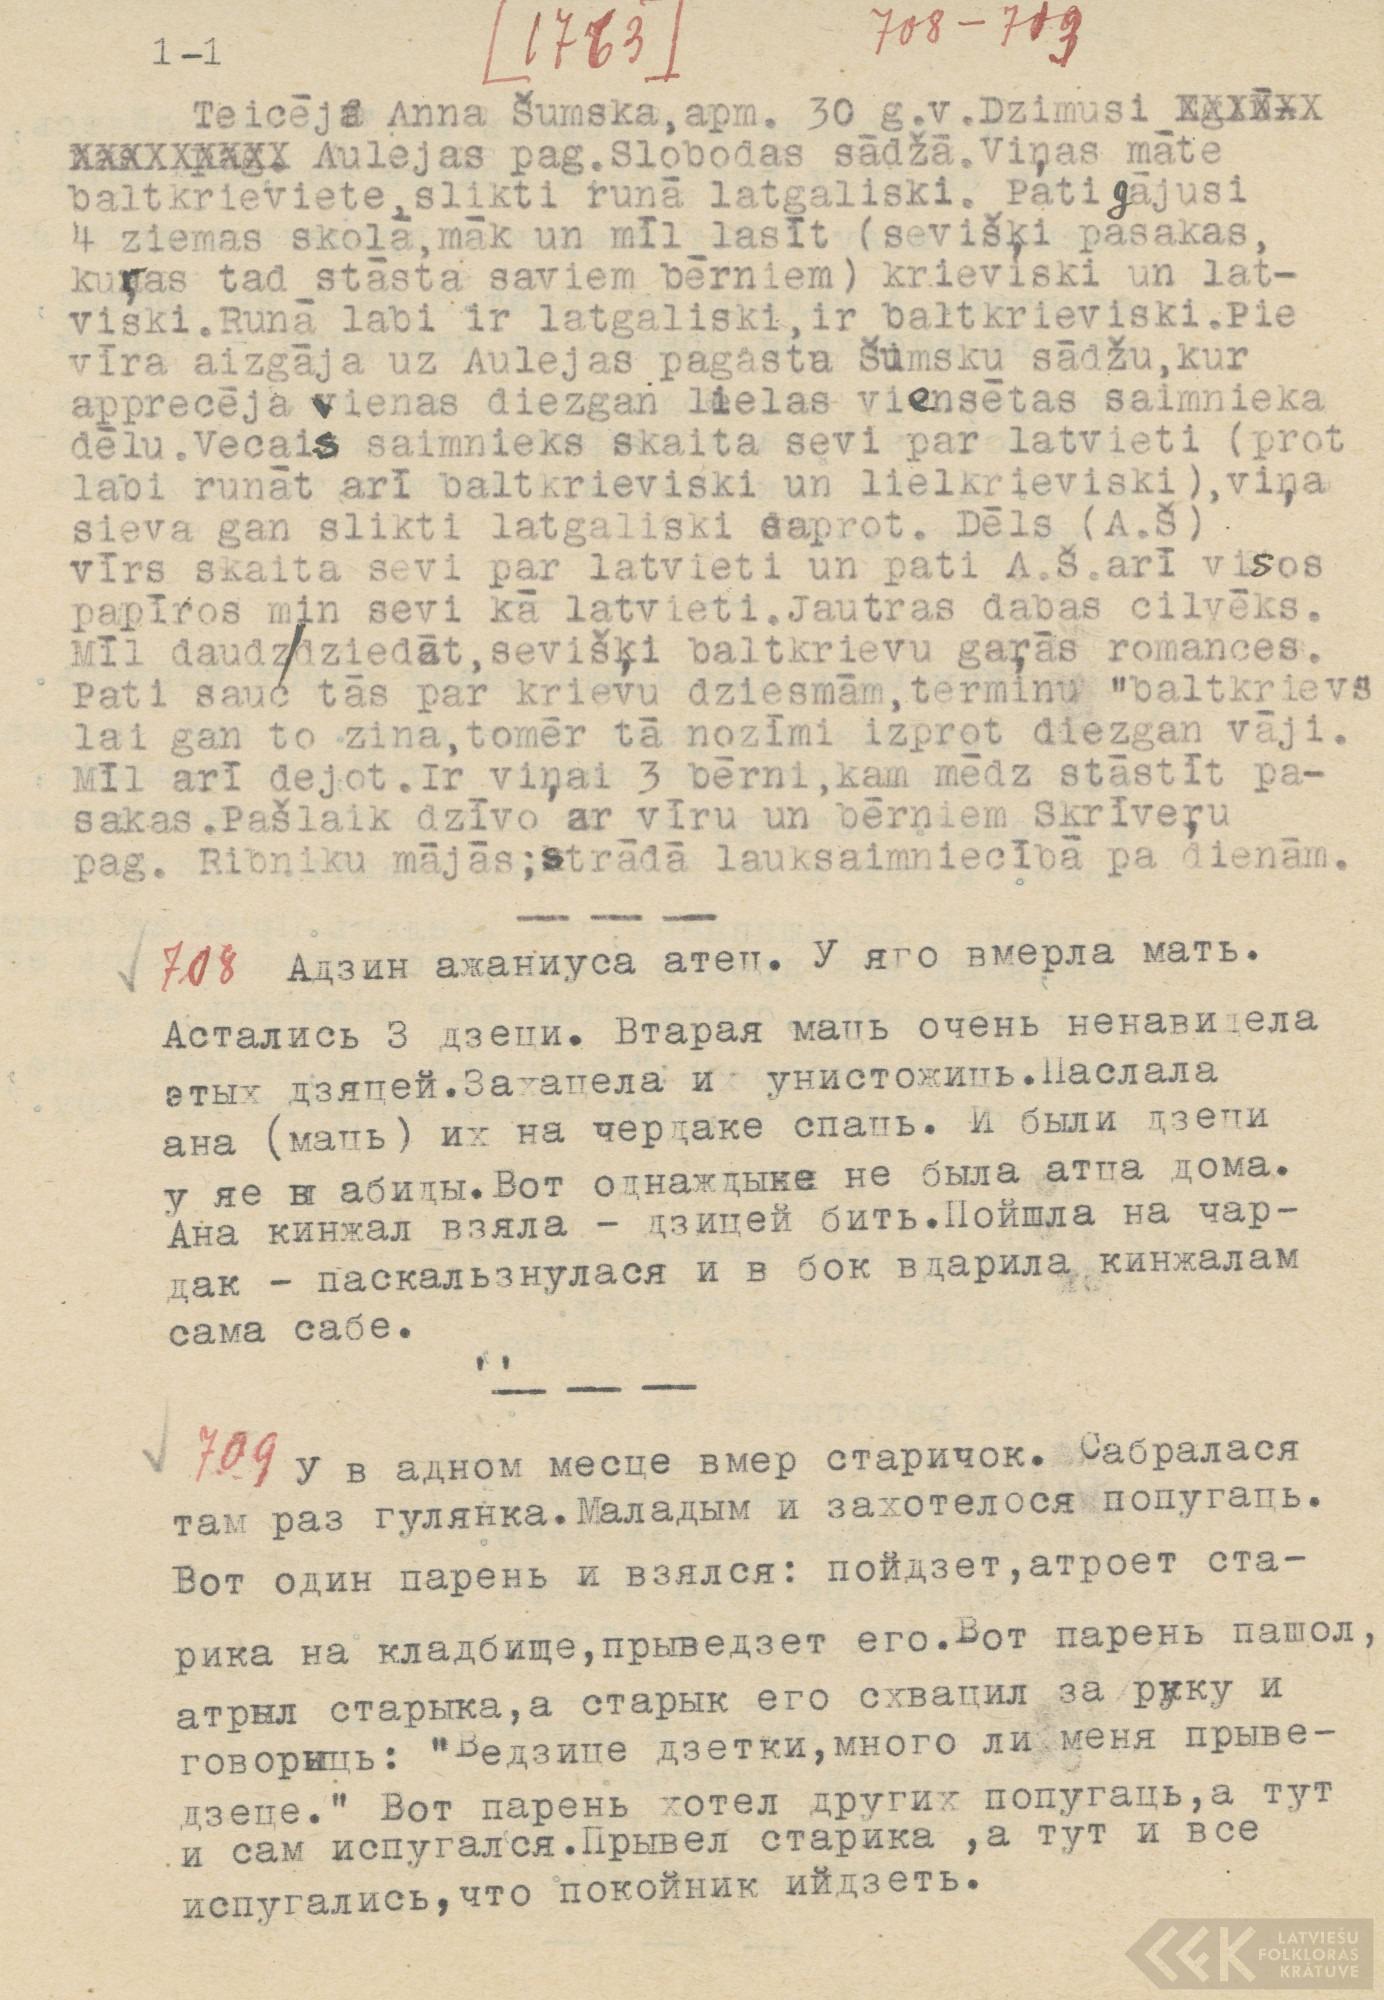 1763-Infantjeva-vakums-01-0230